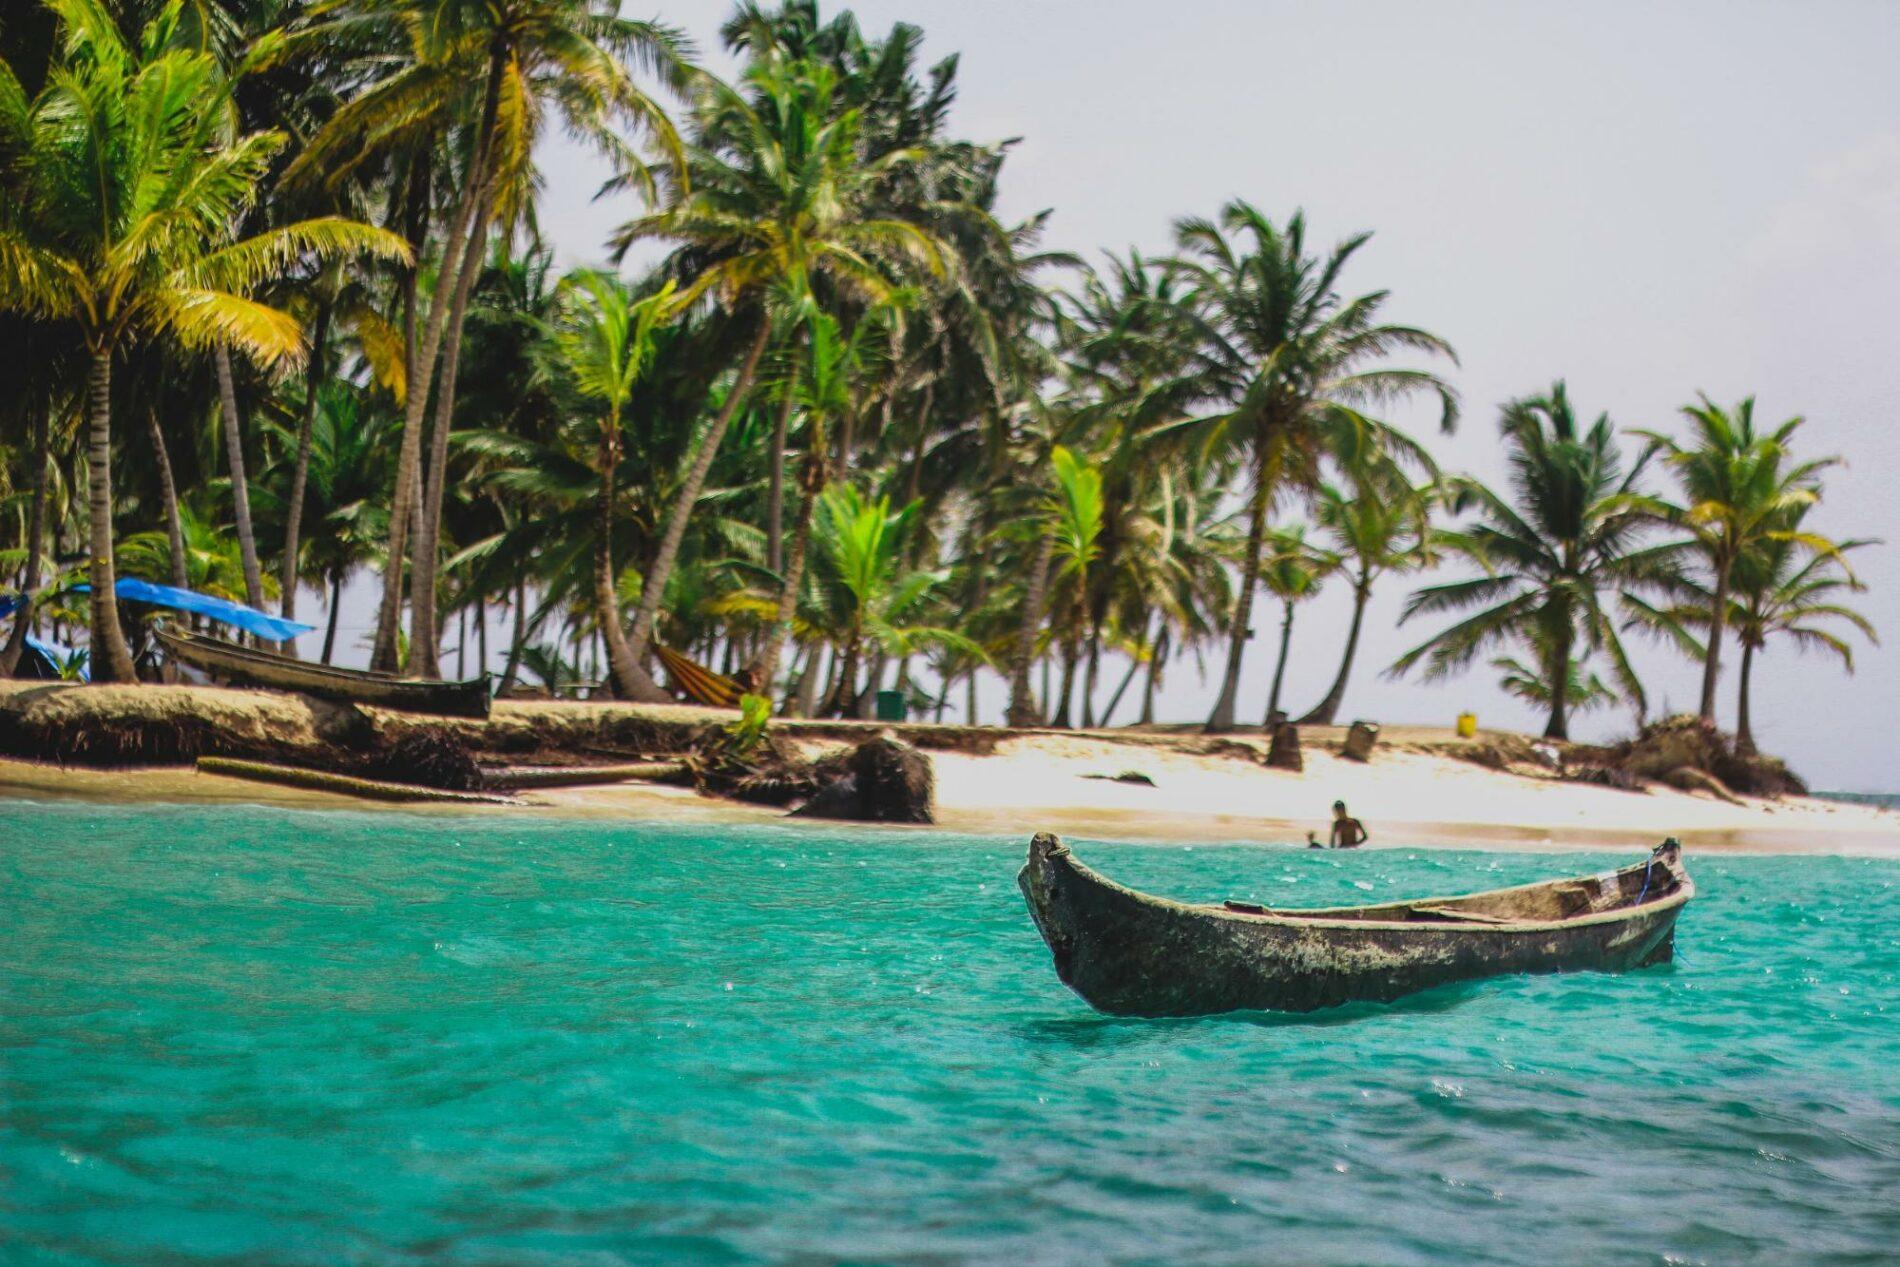 Visit the Kuna Indians in the beautiful San Blas Islands